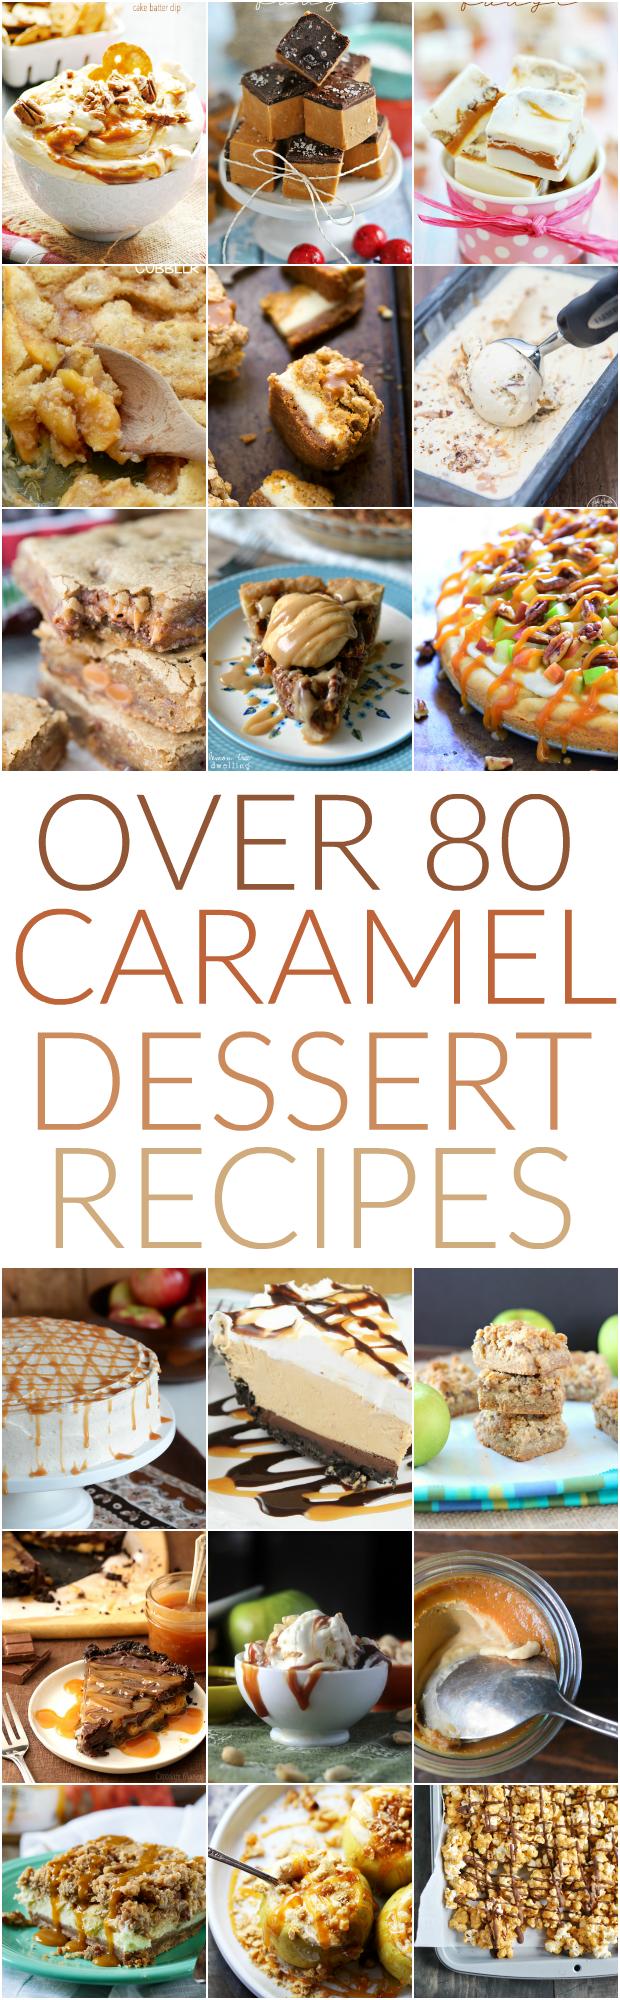 More than 80 Caramel Dessert Recipes including Easy Caramel Fudge, Caramel Corn, and Butter Pecan Caramel Cake Dip :)